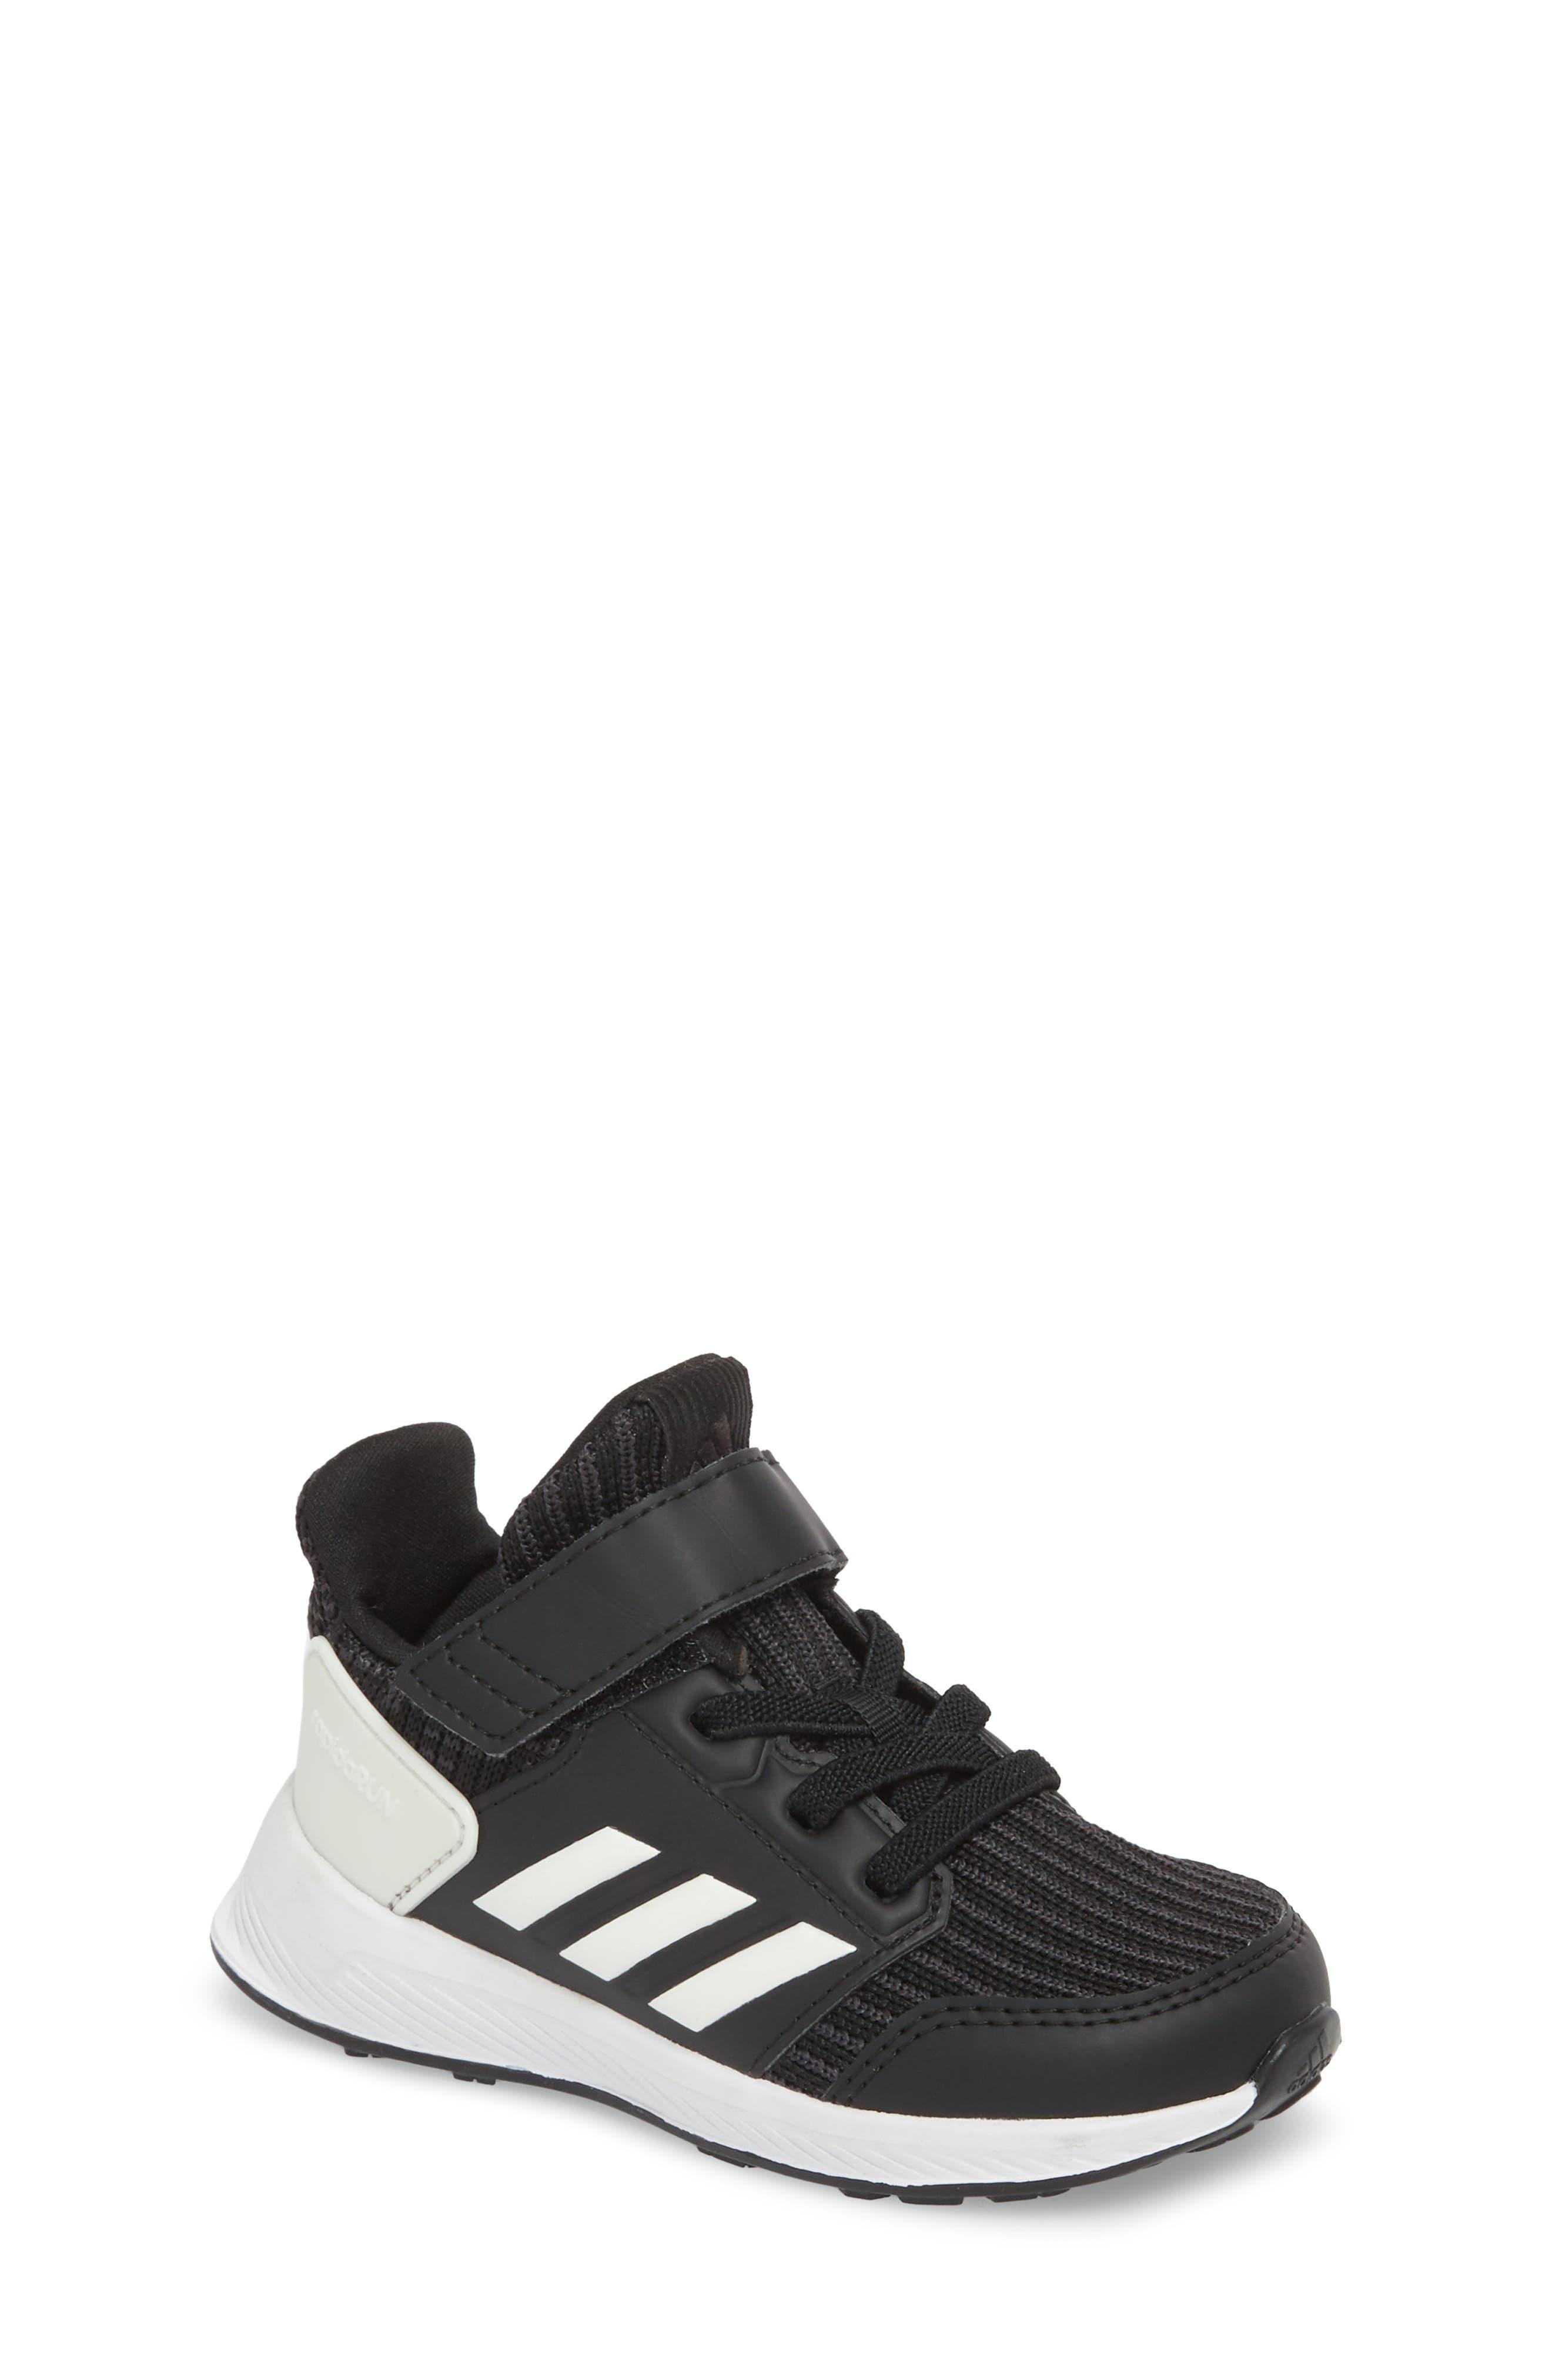 RapidaRun Knit Sneaker,                         Main,                         color, BLACK/ WHITE